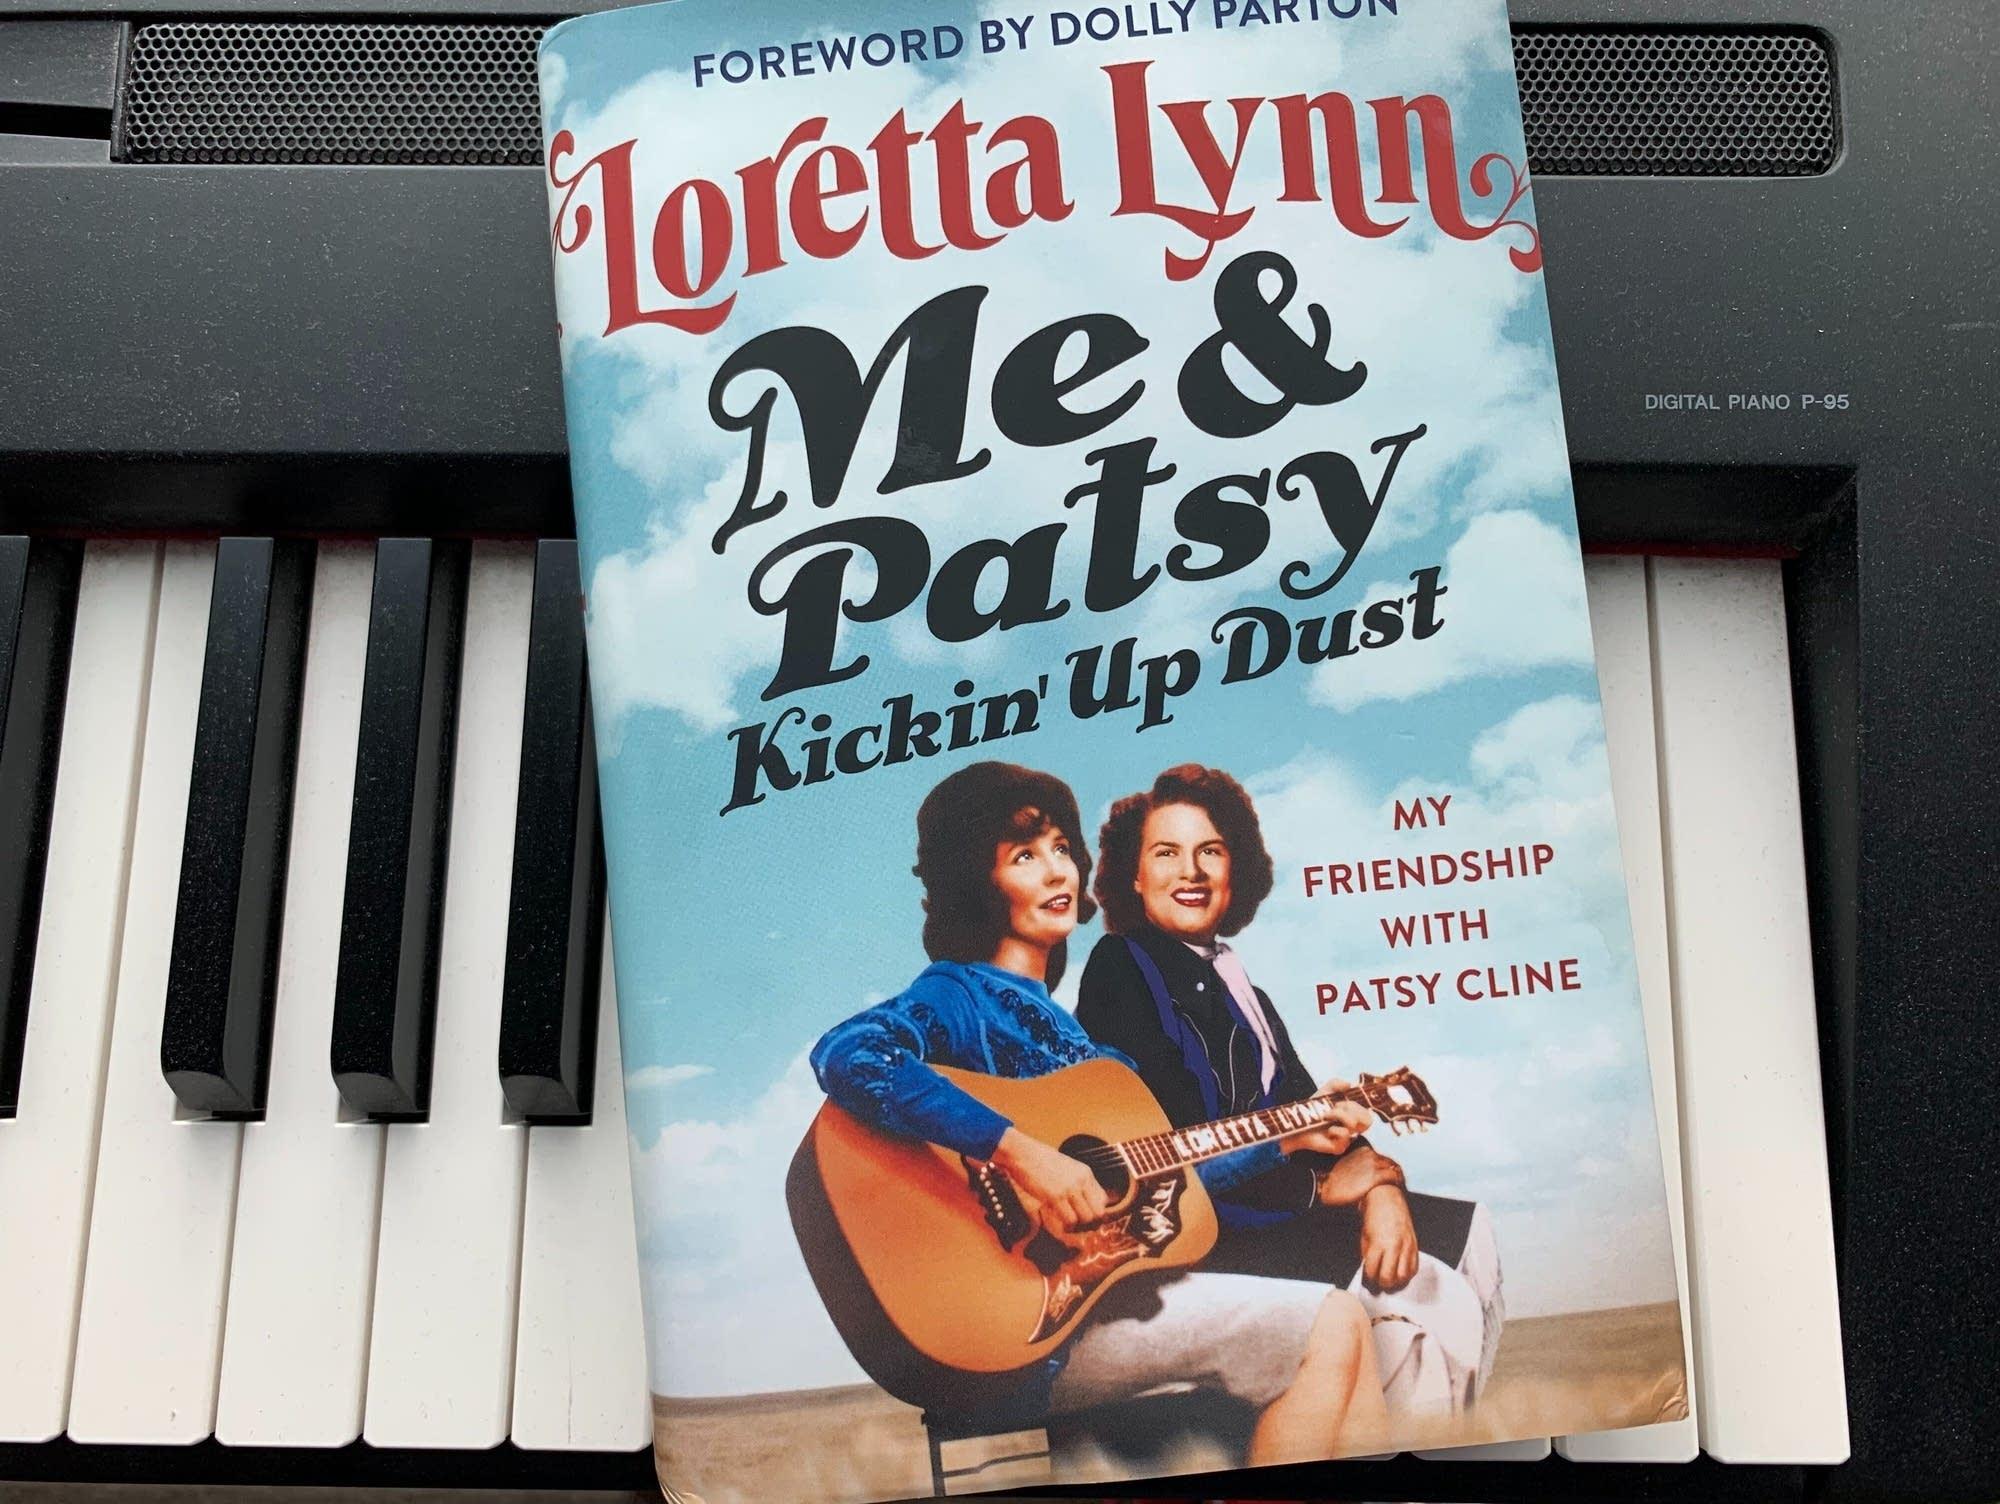 'Me & Patsy Kickin' Up Dust: My Friendship with Patsy Cline.'